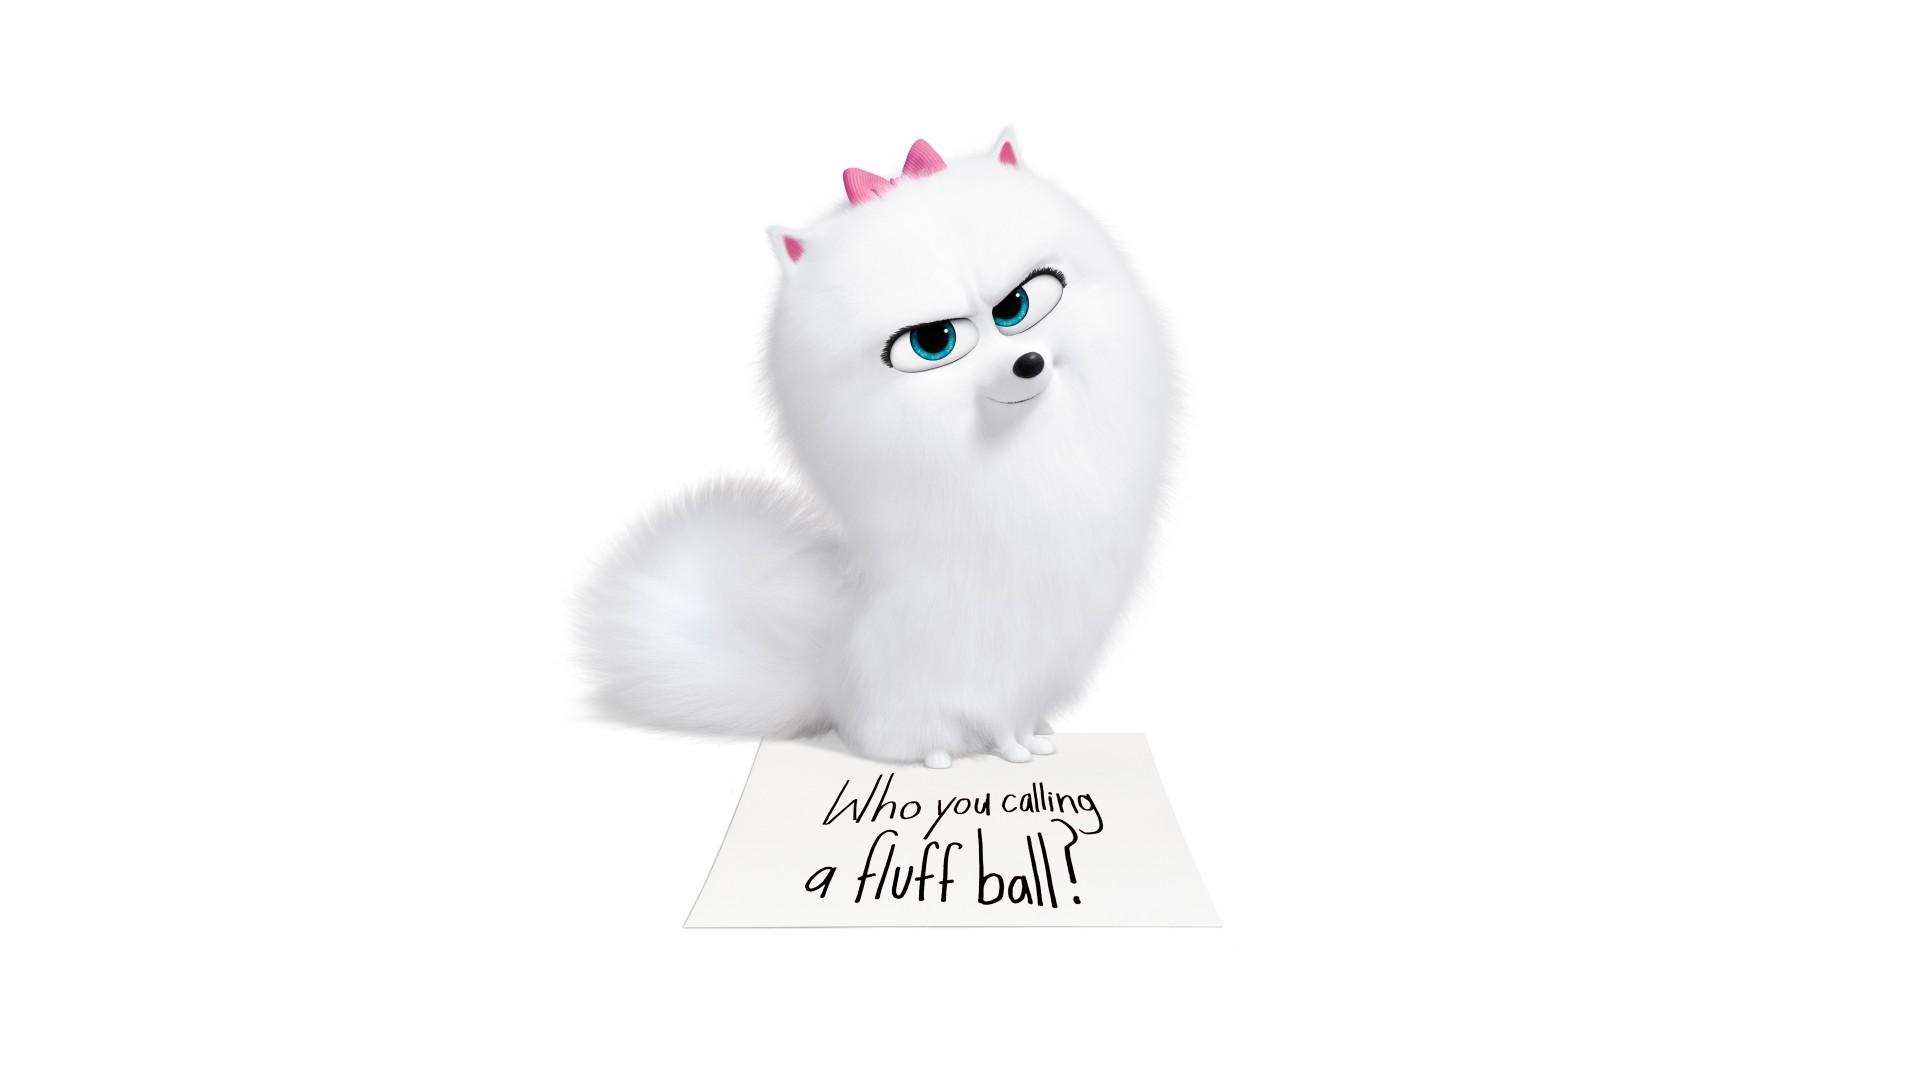 Cute Rabbit Wallpapers For Desktop Cute Gidget In The Secret Life Of Pets 2 4k 8k Wallpapers